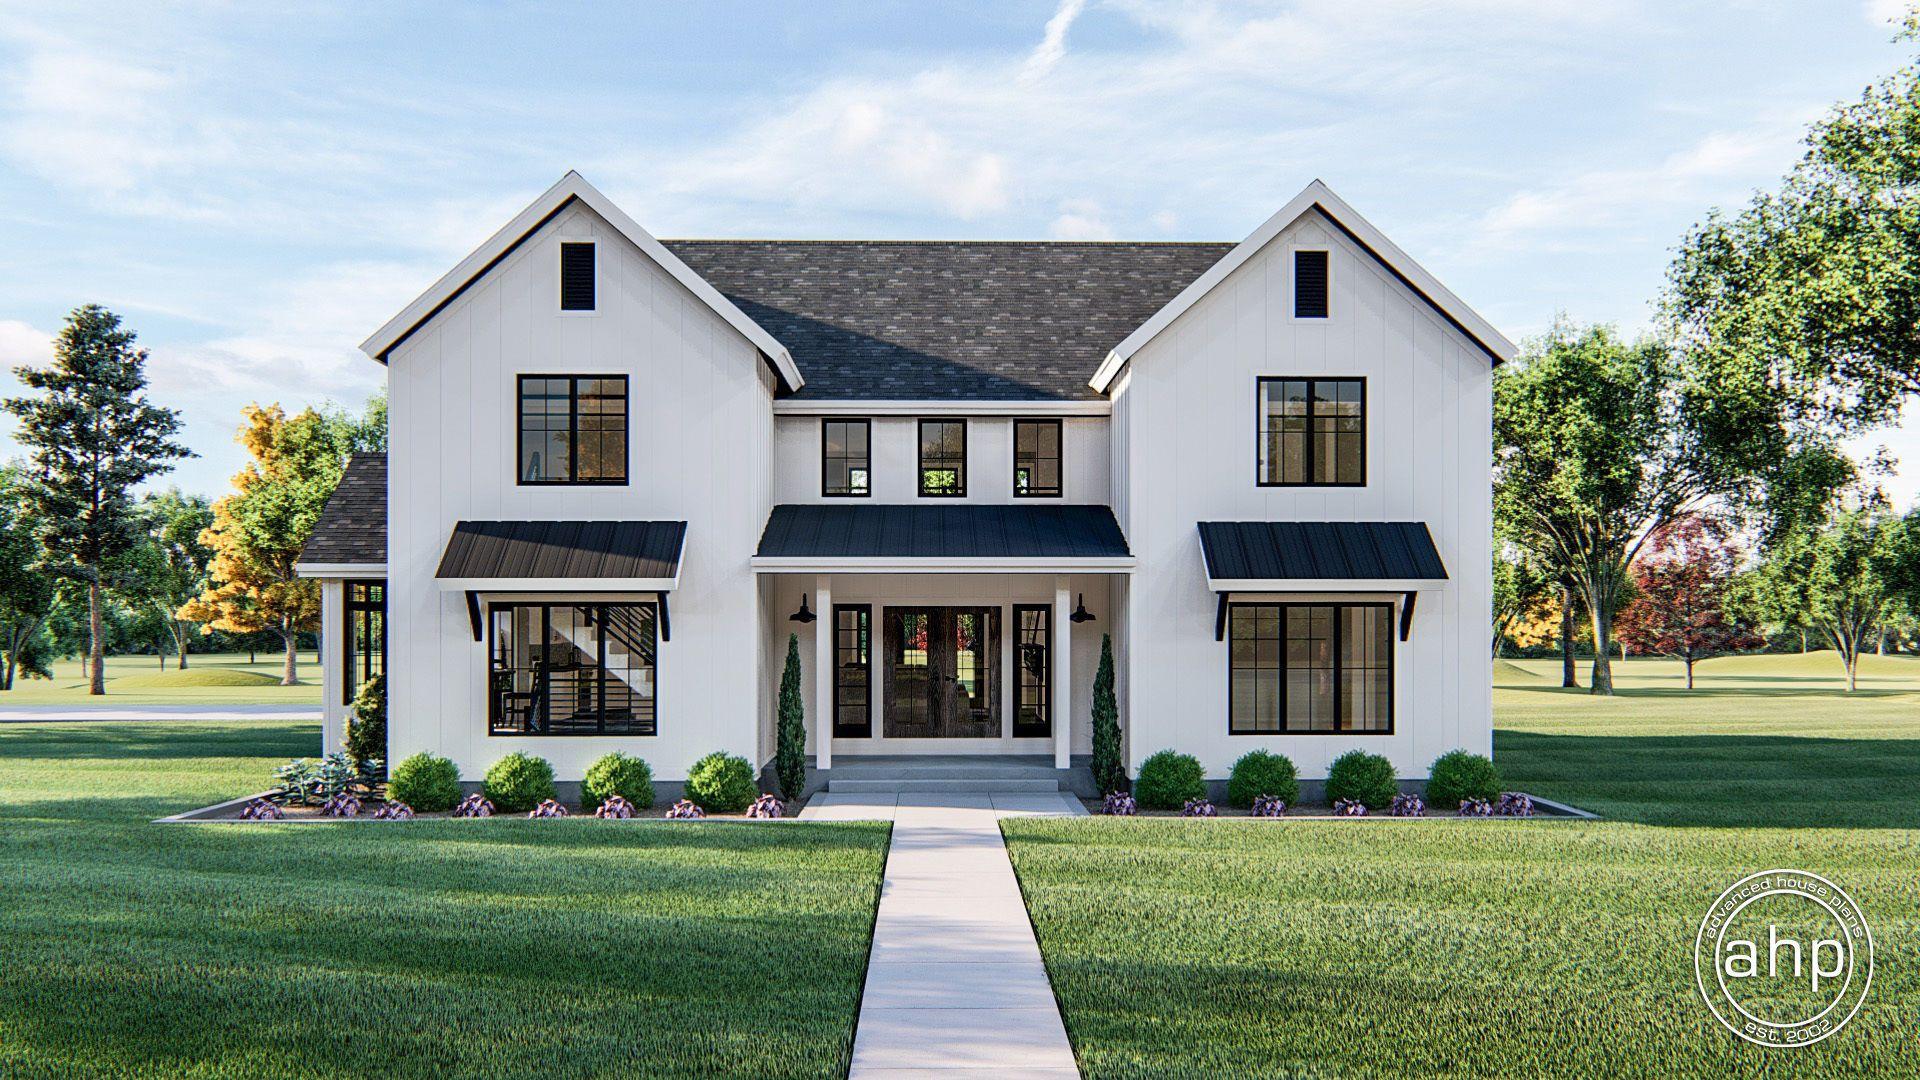 1.5 Story Modern Farmhouse Style House Plan | Savannah #modernfarmhousestyle